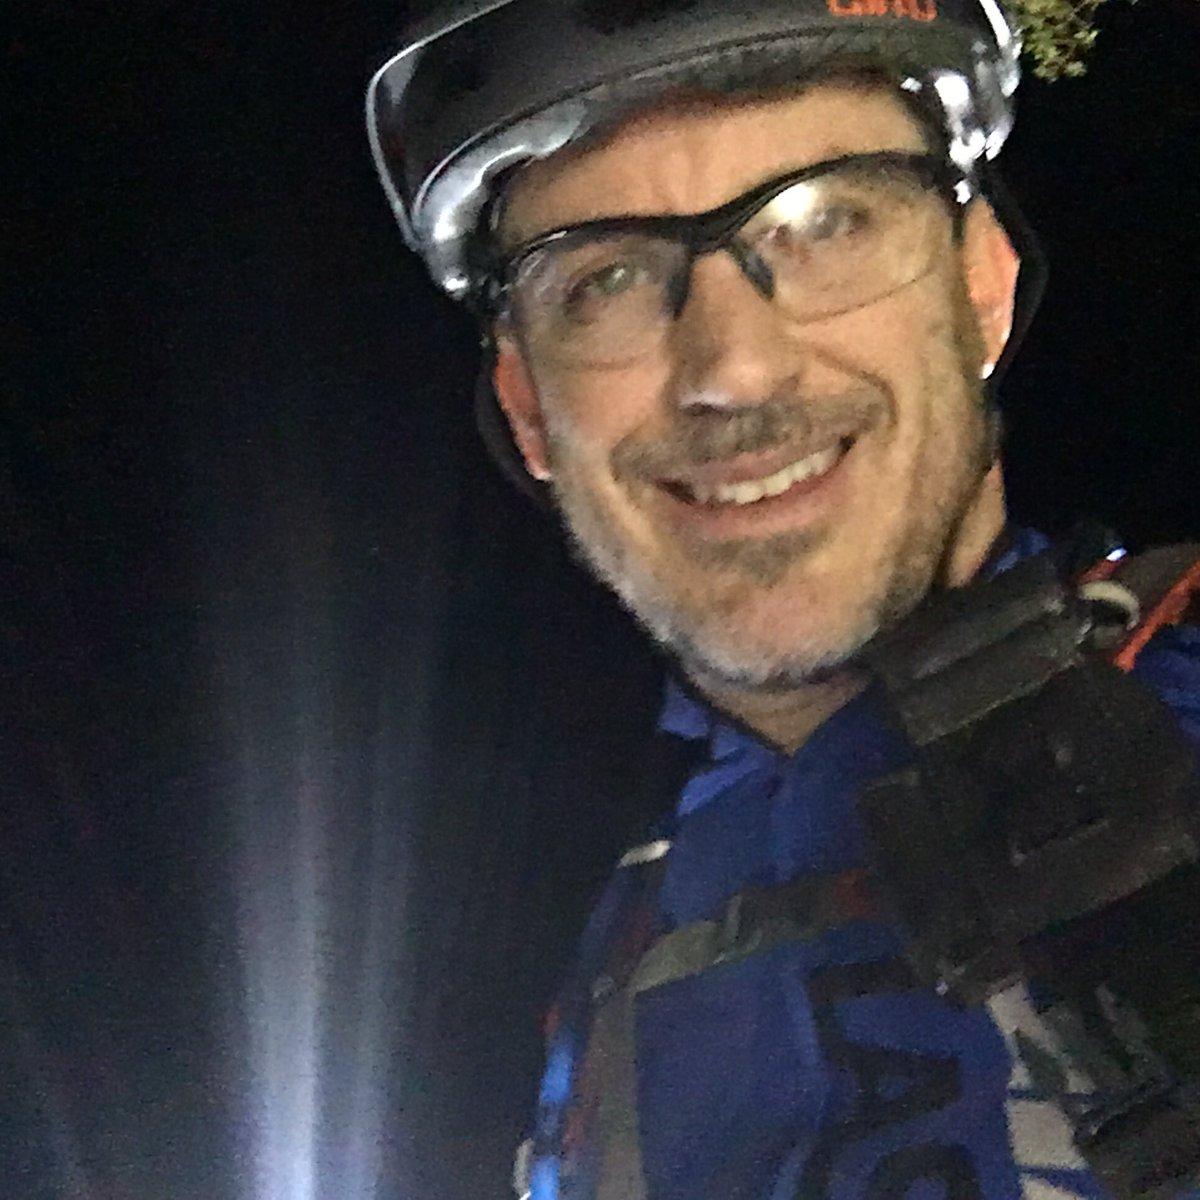 Photos from the Tuesday Night #MTB ride with @GiantLasVegas and the crew  #vegasmtb #mtbvegas #vegascycling #bikelifepic.twitter.com/JDm4j4dCKR